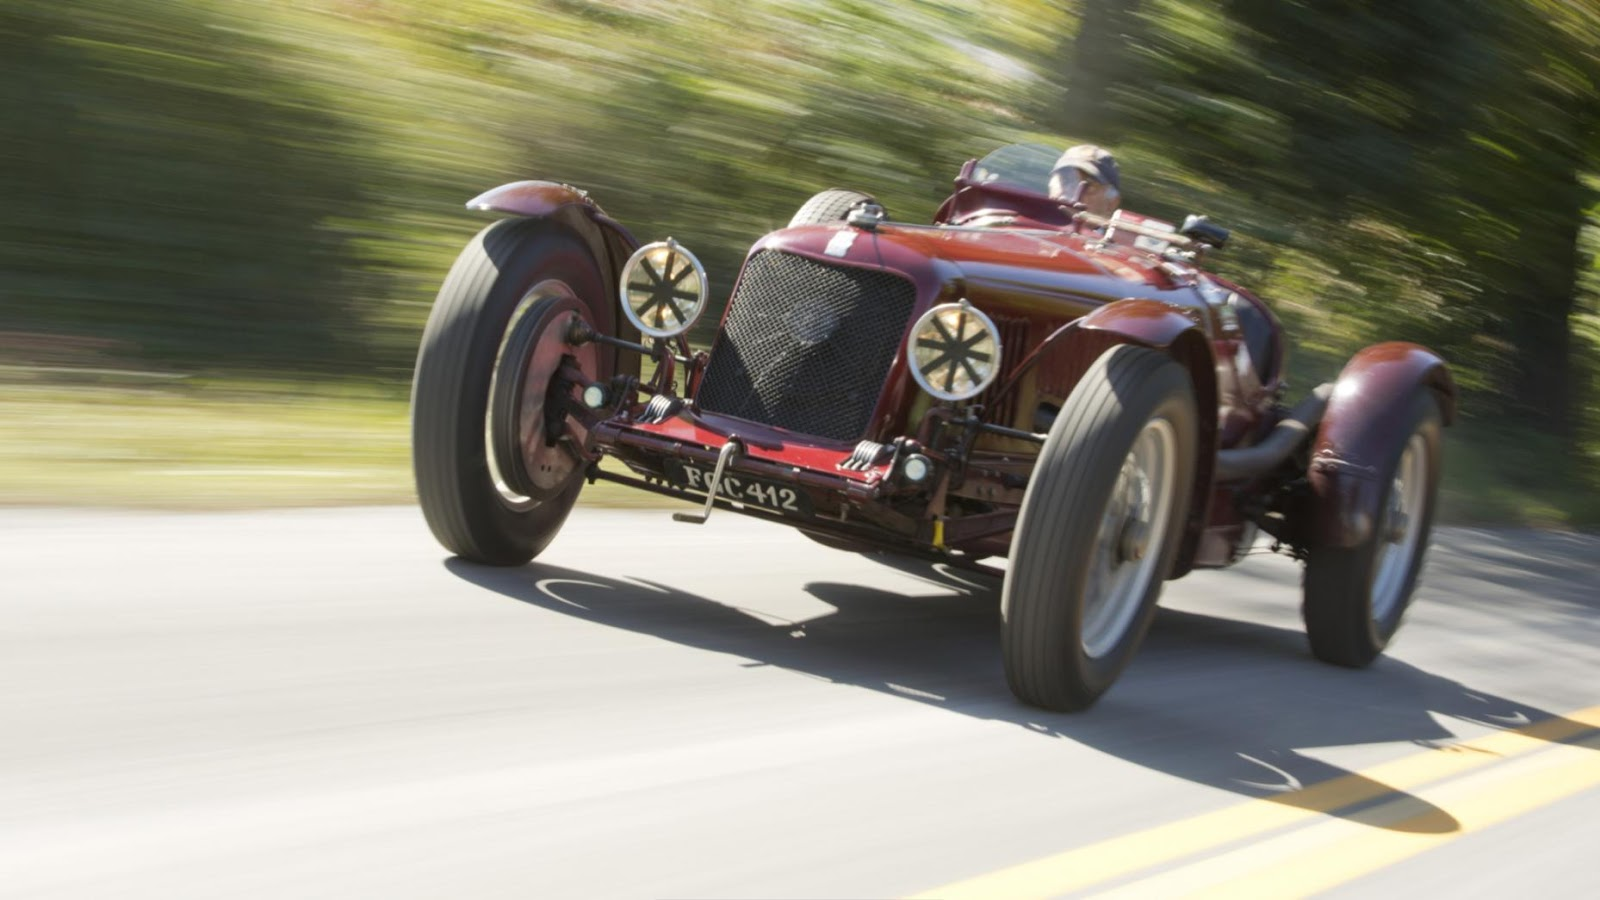 1933 Maserati 8C 3000 BiPosto: $1,001,000